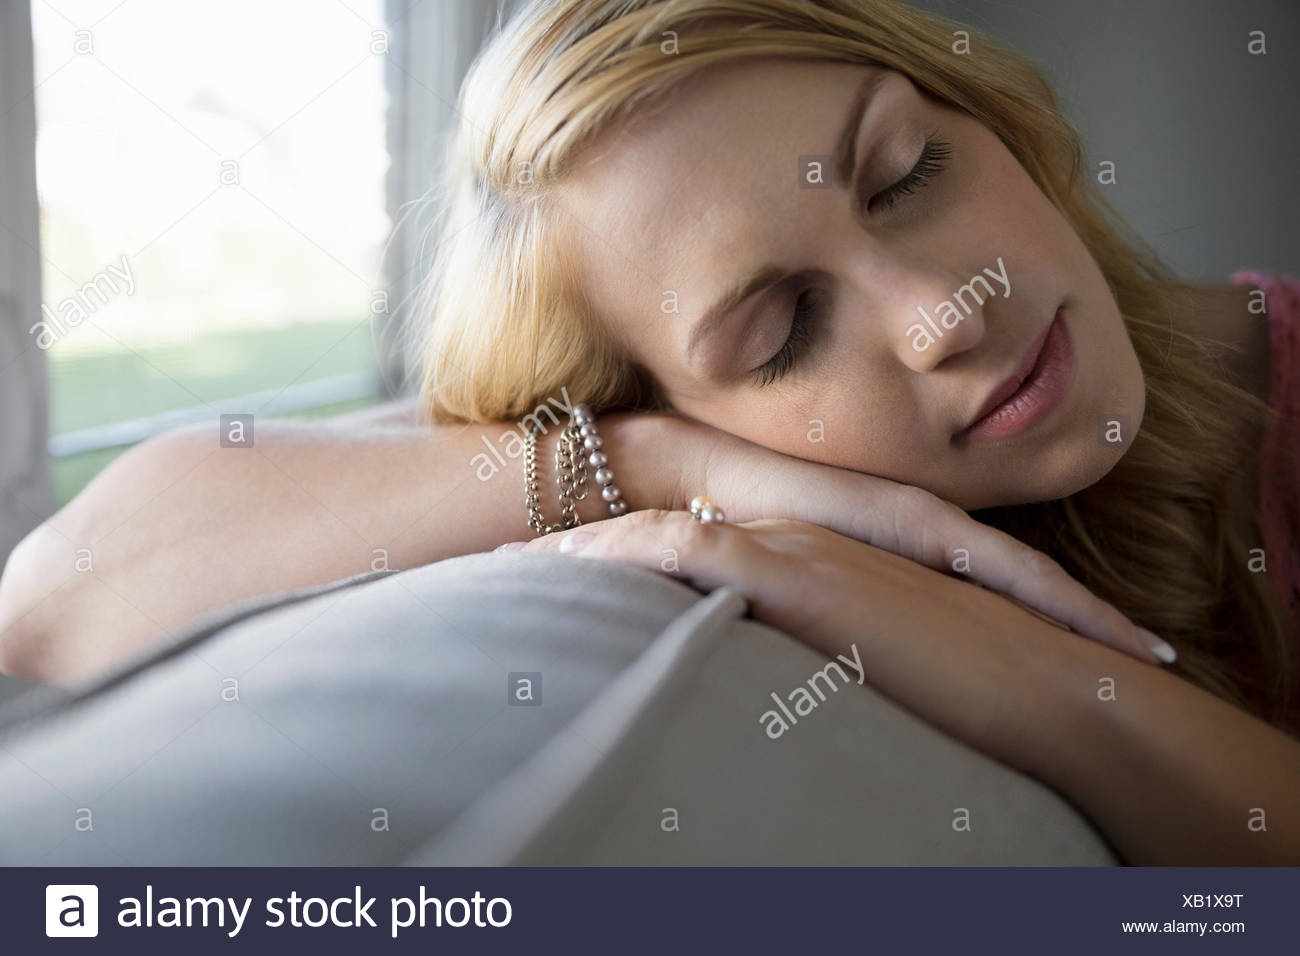 Serene woman sleeping on sofa - Stock Image